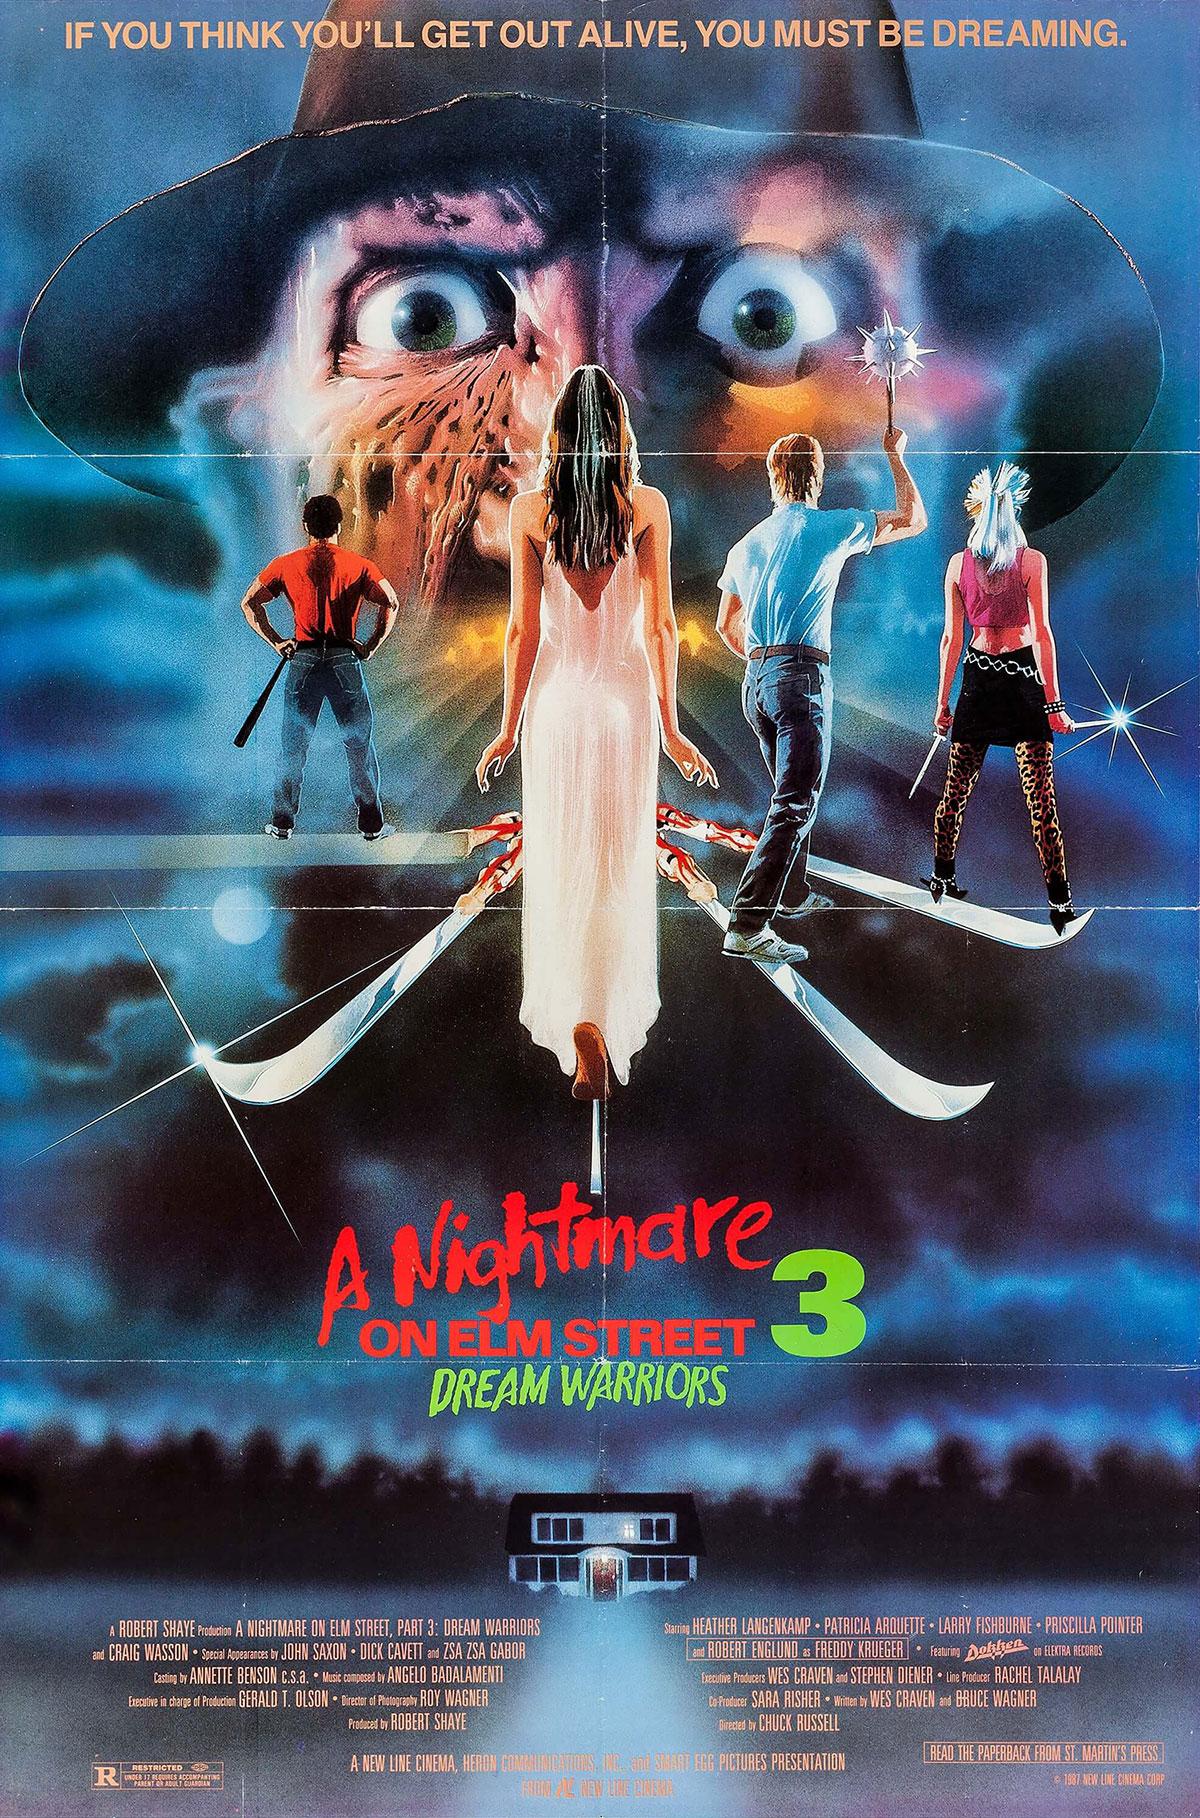 A Nightmare on Elm Street 3: Dream Warriors movie poster